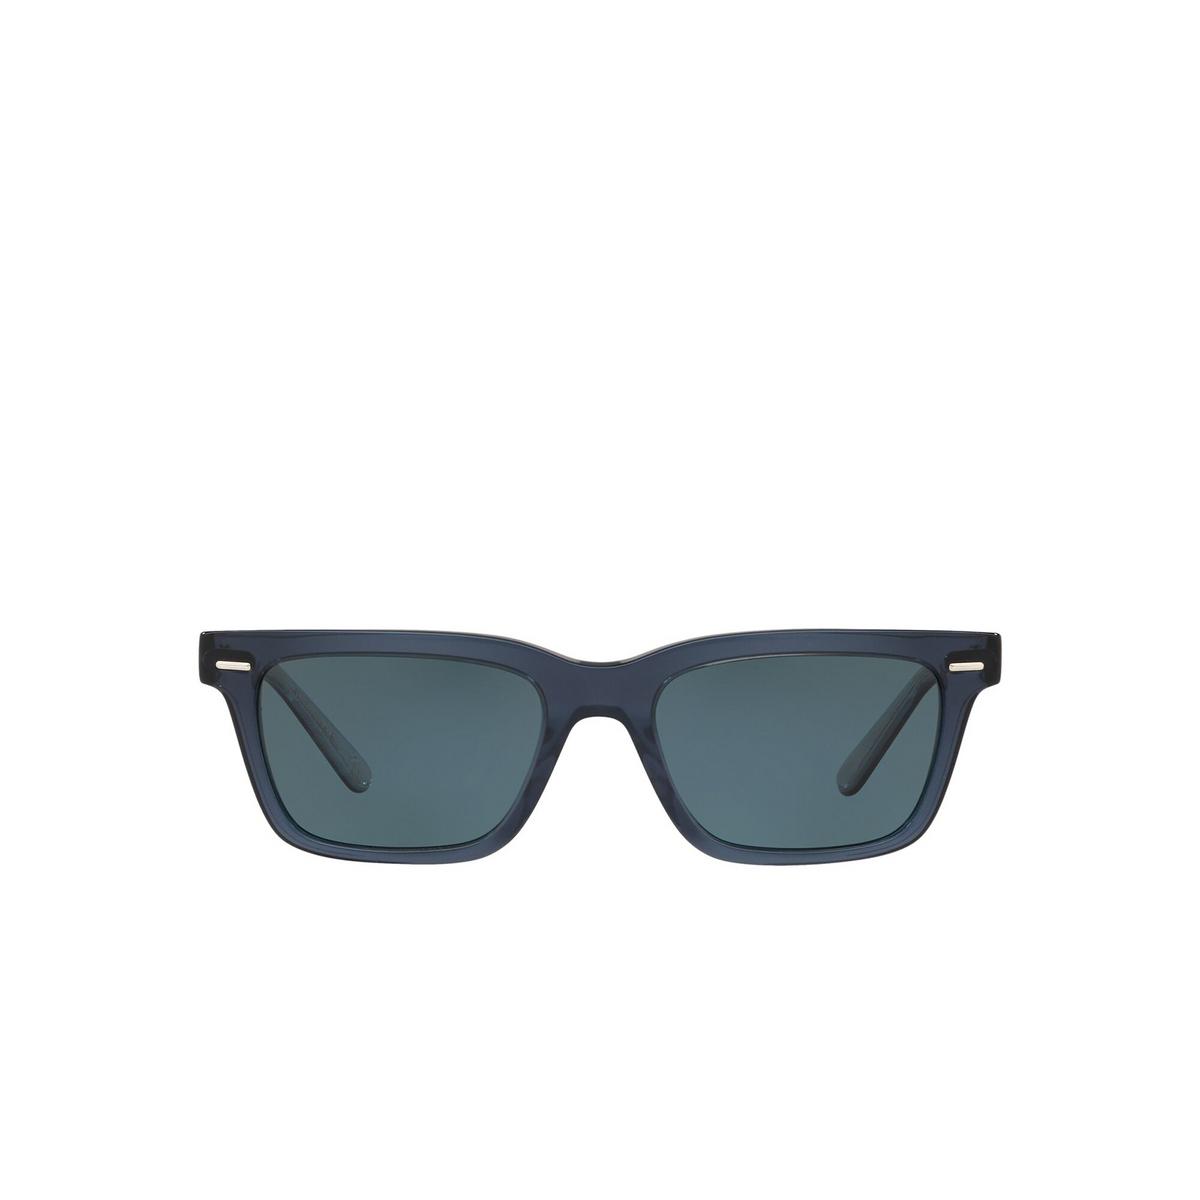 Oliver Peoples® Square Sunglasses: Ba Cc OV5388SU color Vivid Blue 16643R - front view.